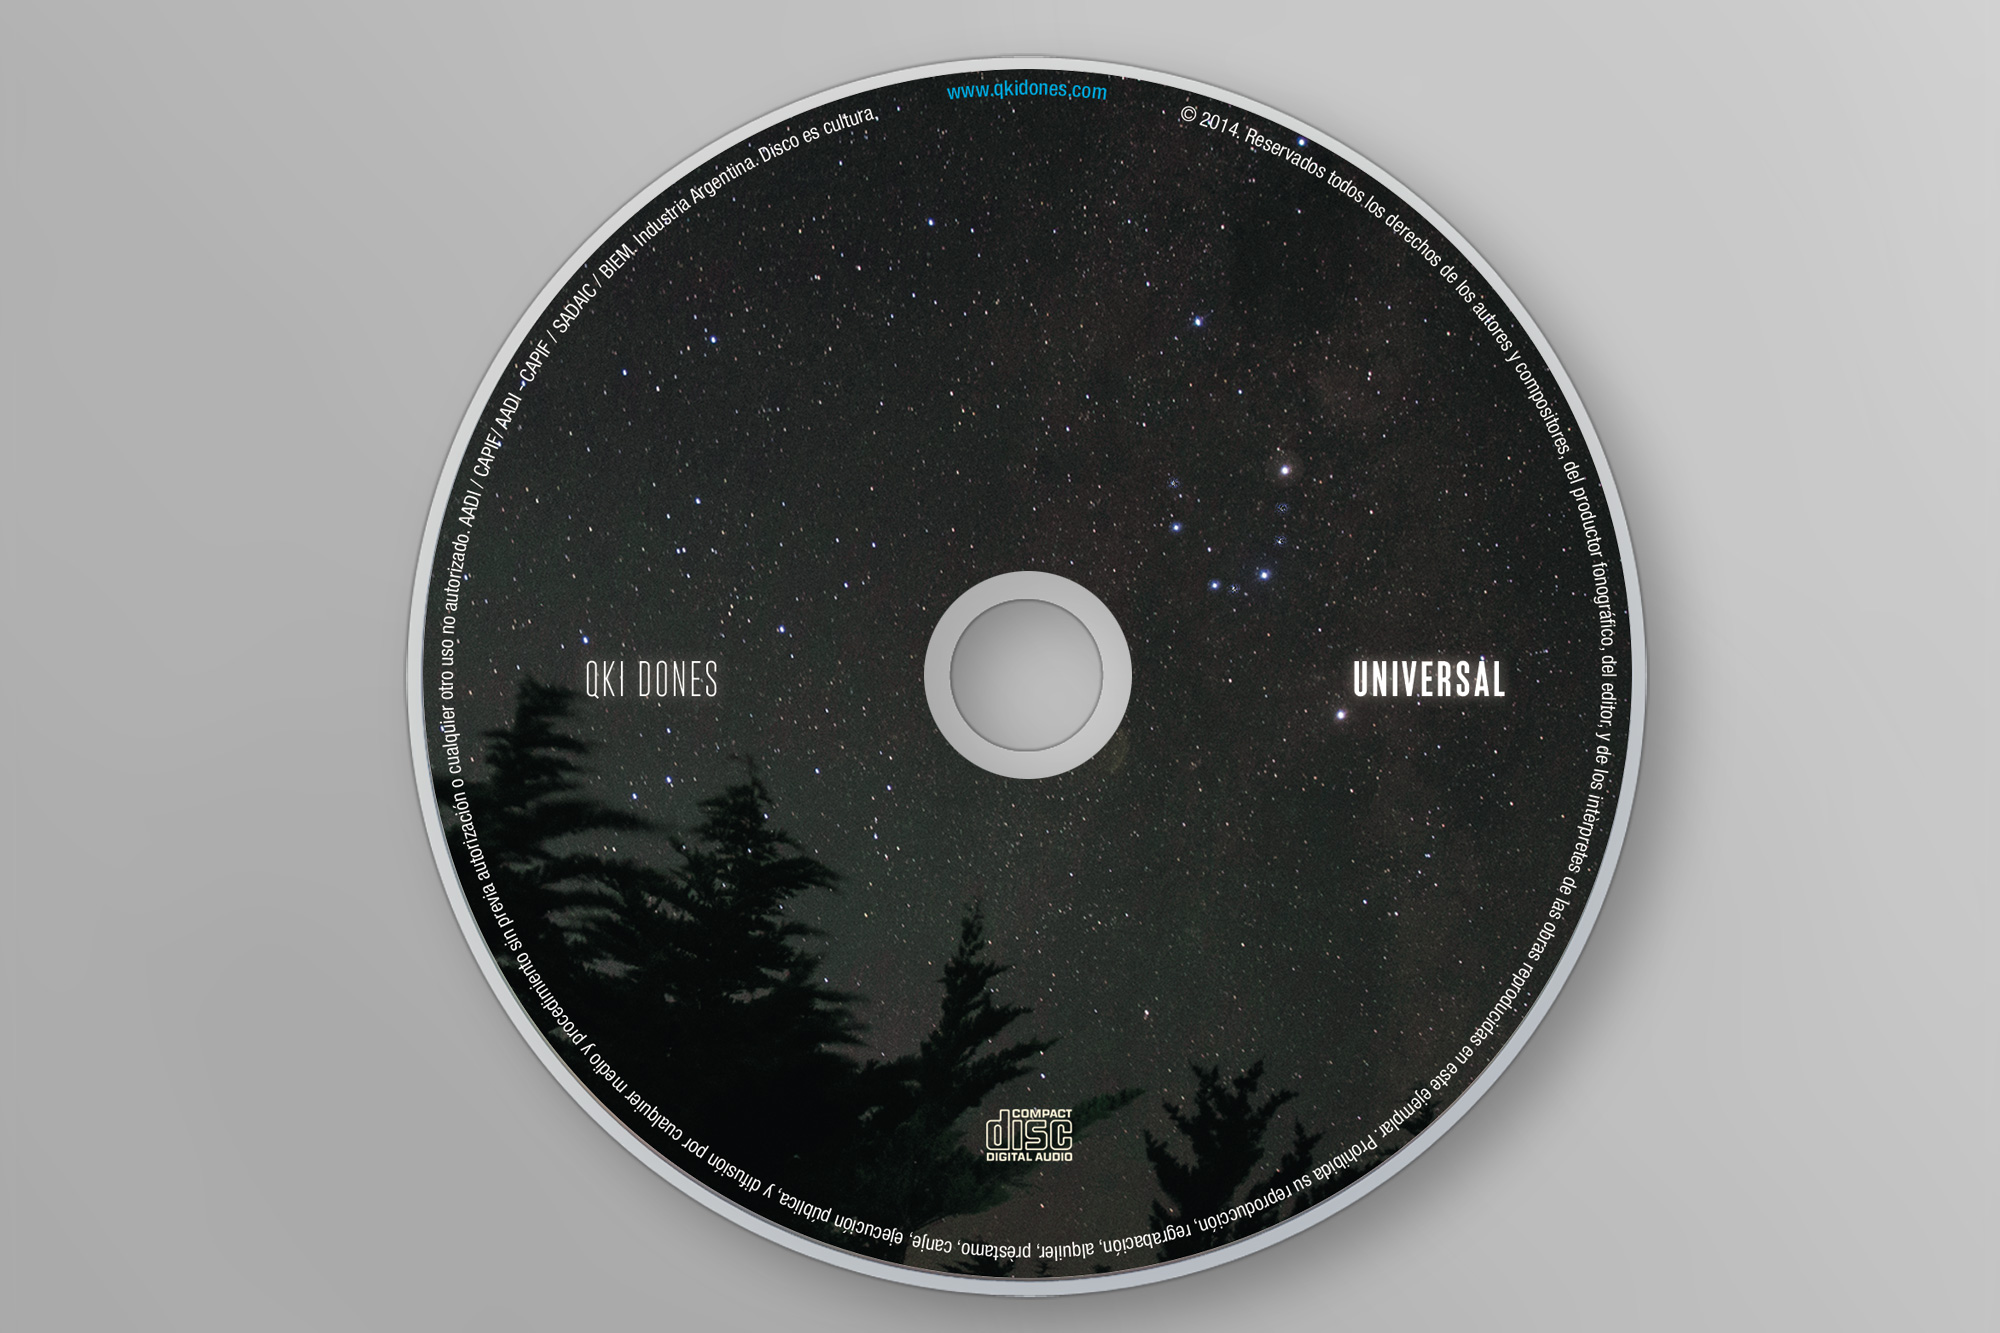 QKI-DONES-UNIVERSAL-CD-STAMP